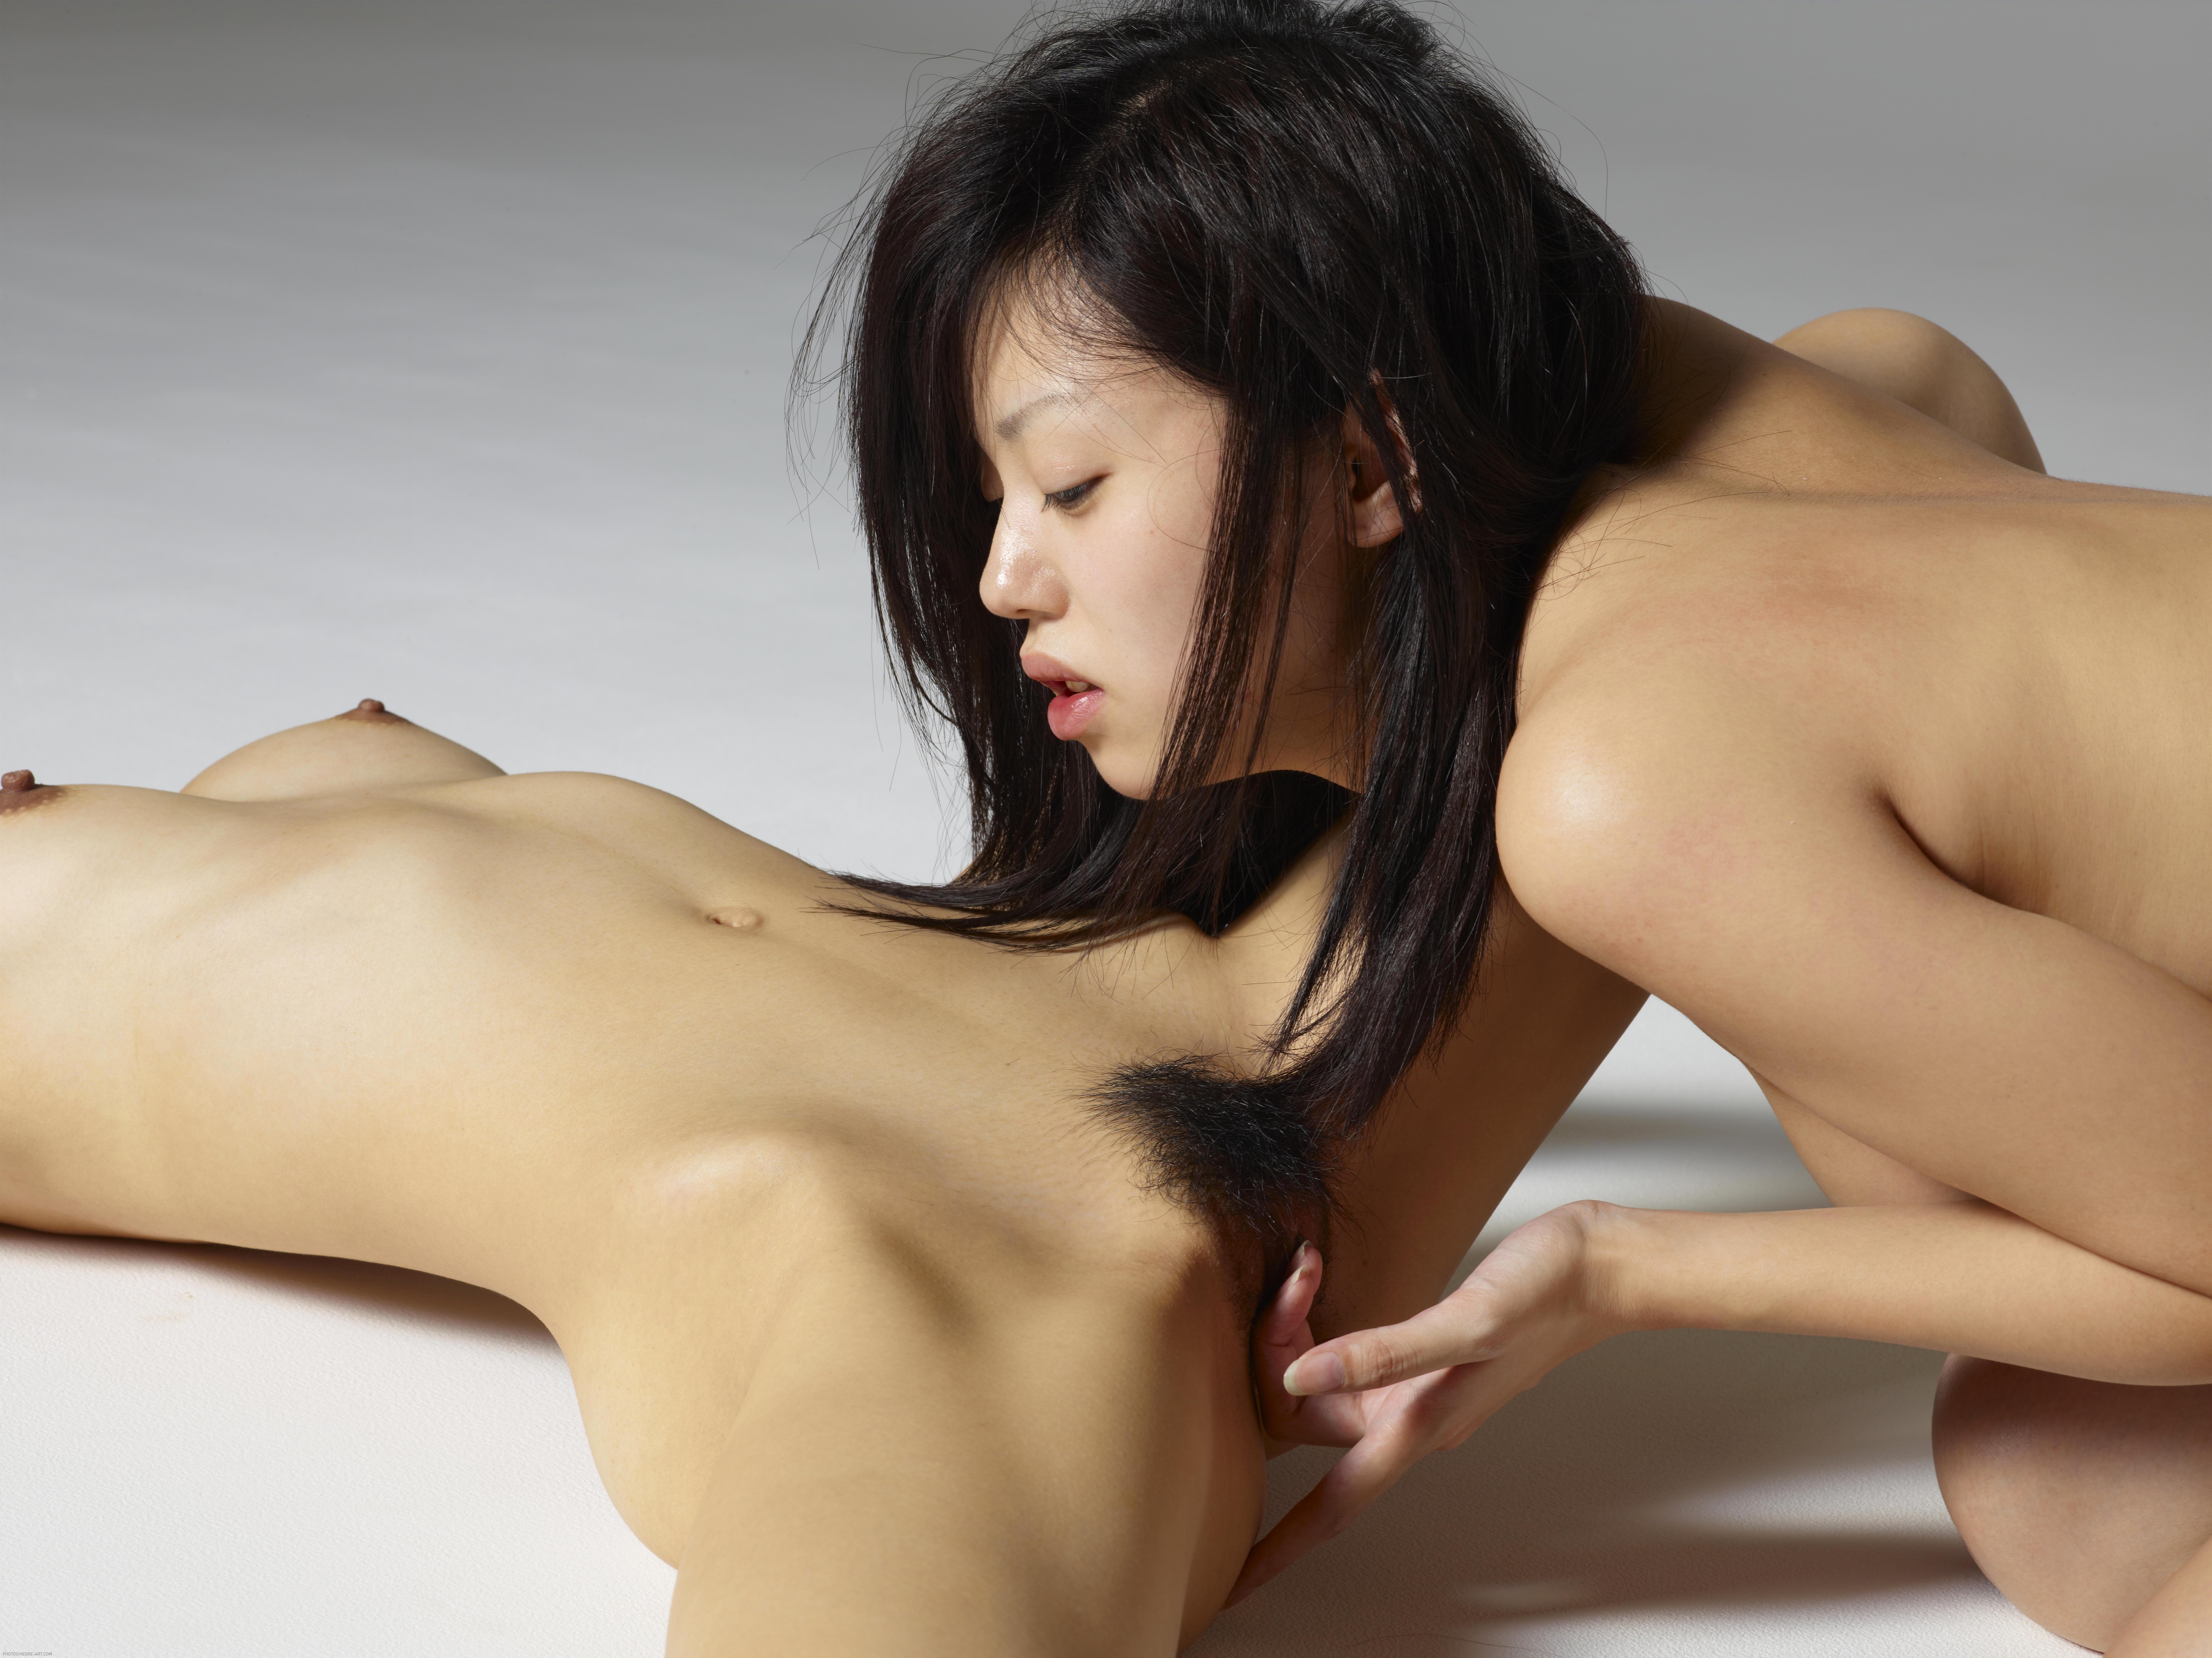 Lesbian tongue fetish porn